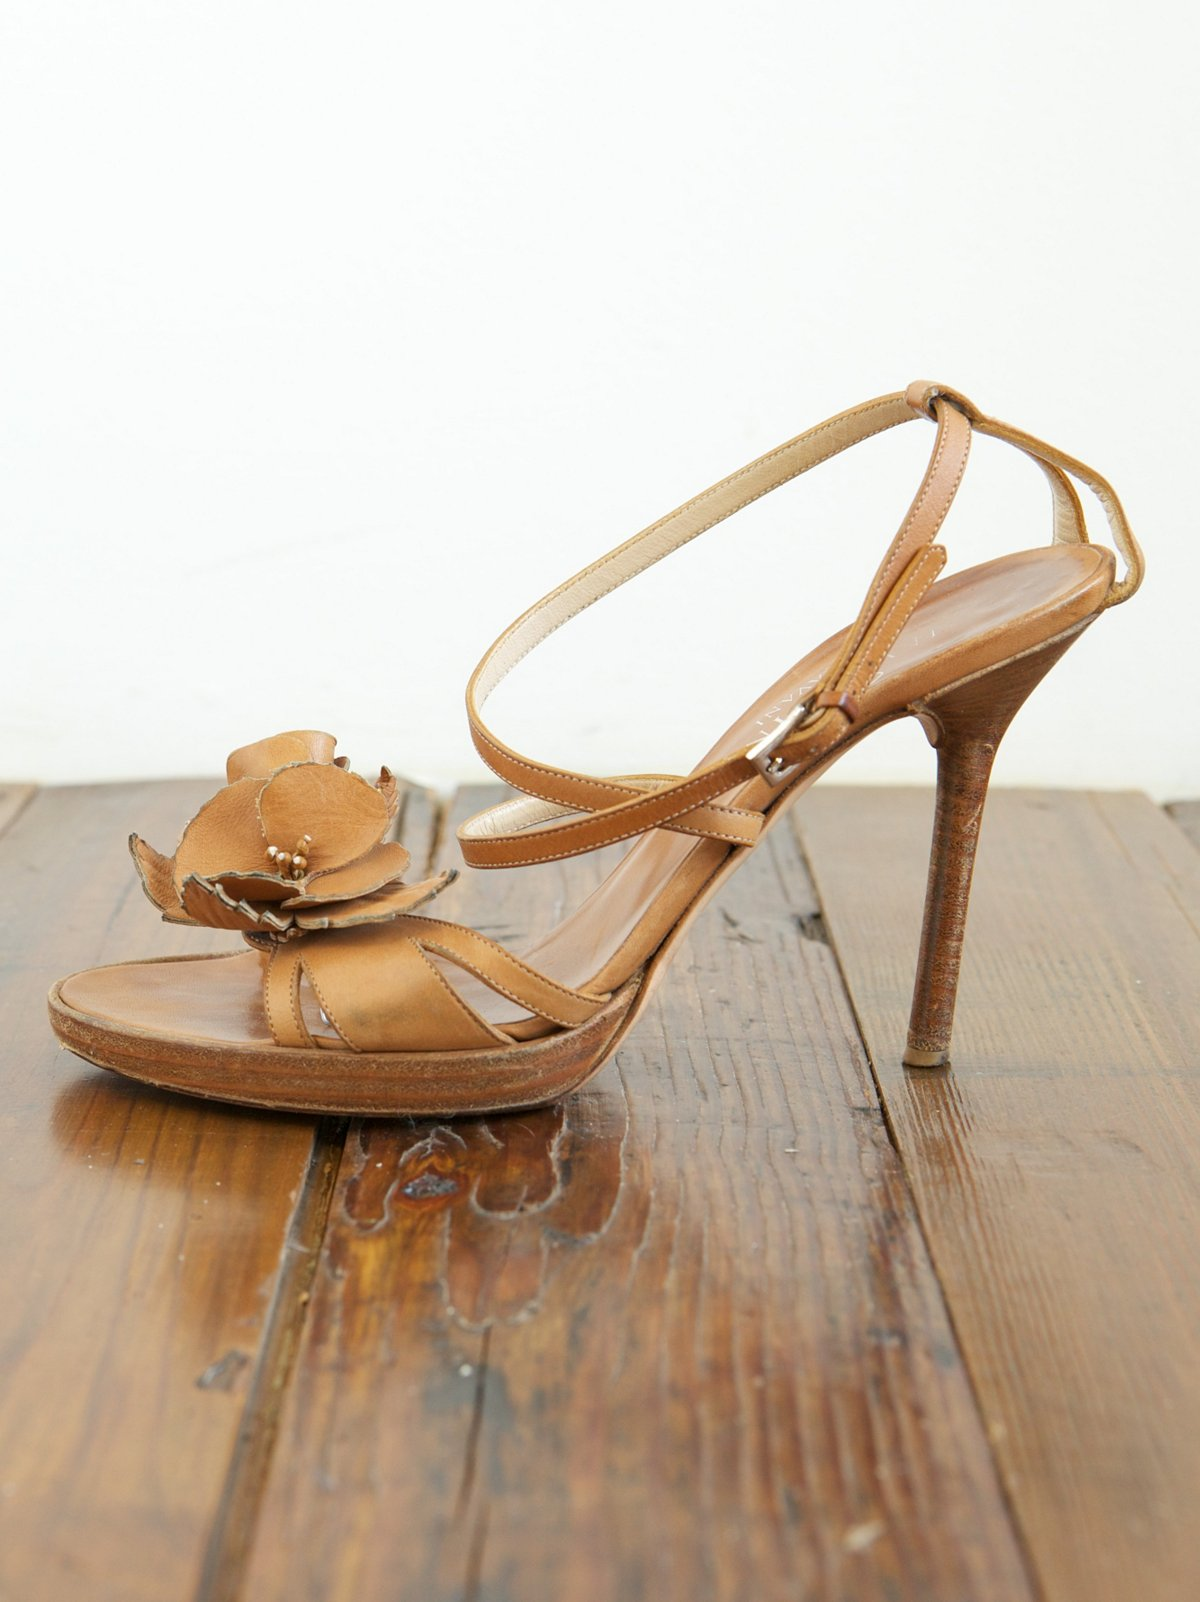 Vintage Valentino Heels